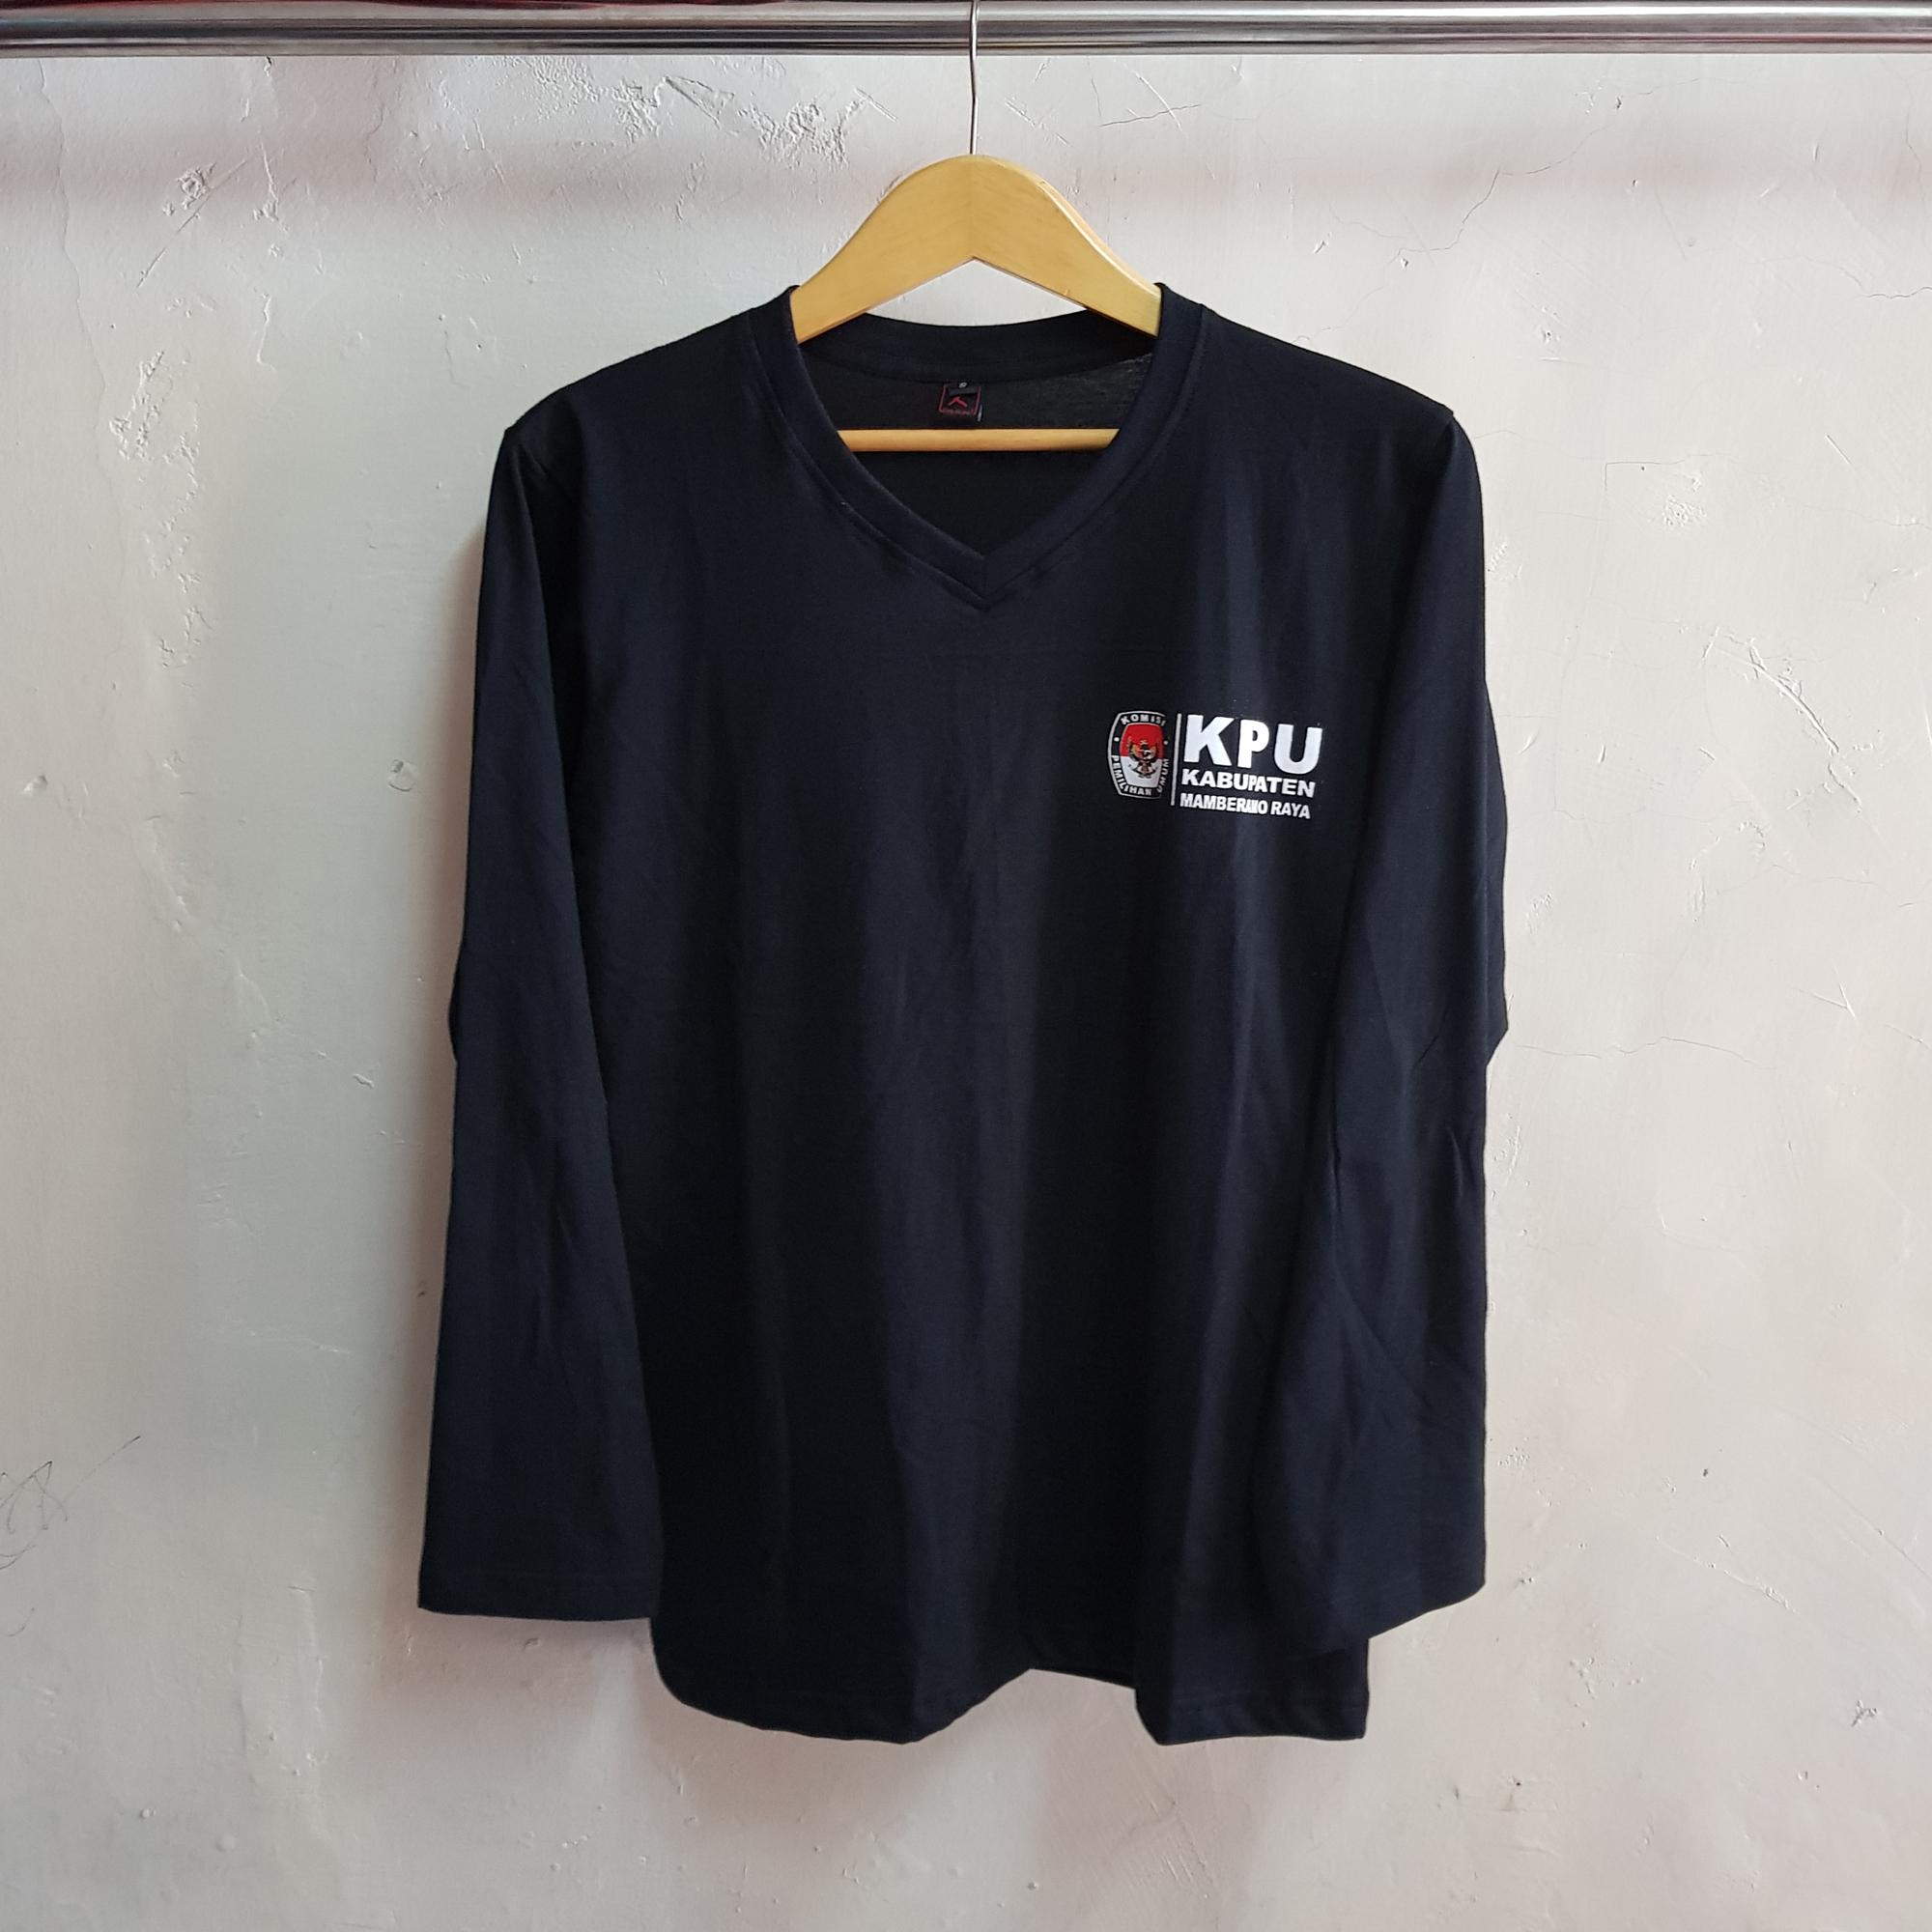 Seragam Kaos KPU, Kaos Oblong V Neck